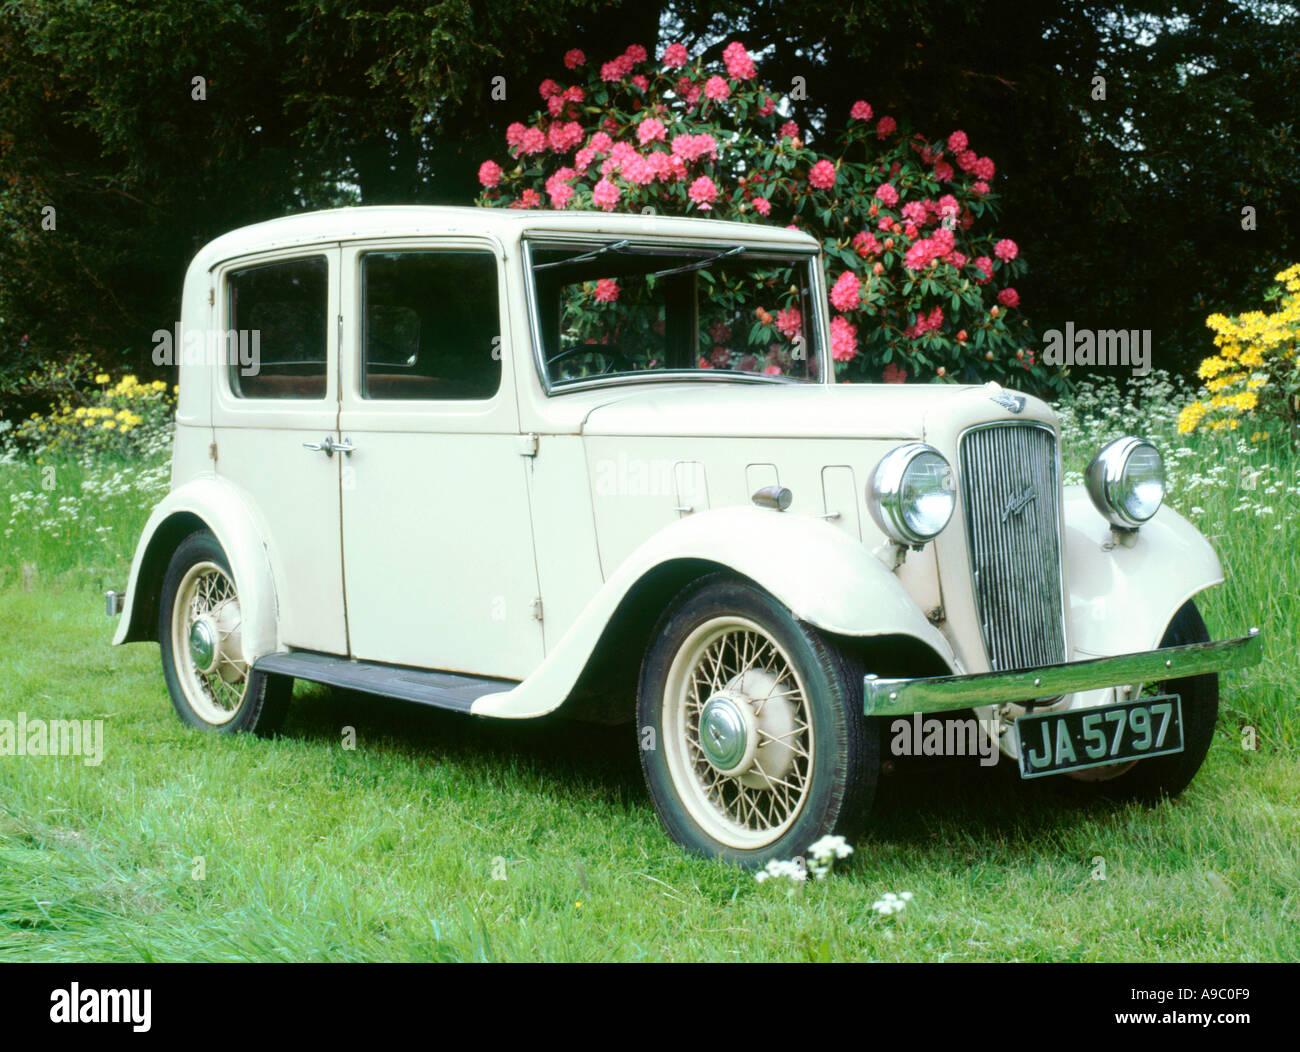 1935 Austin 10 Litchfield - Stock Image